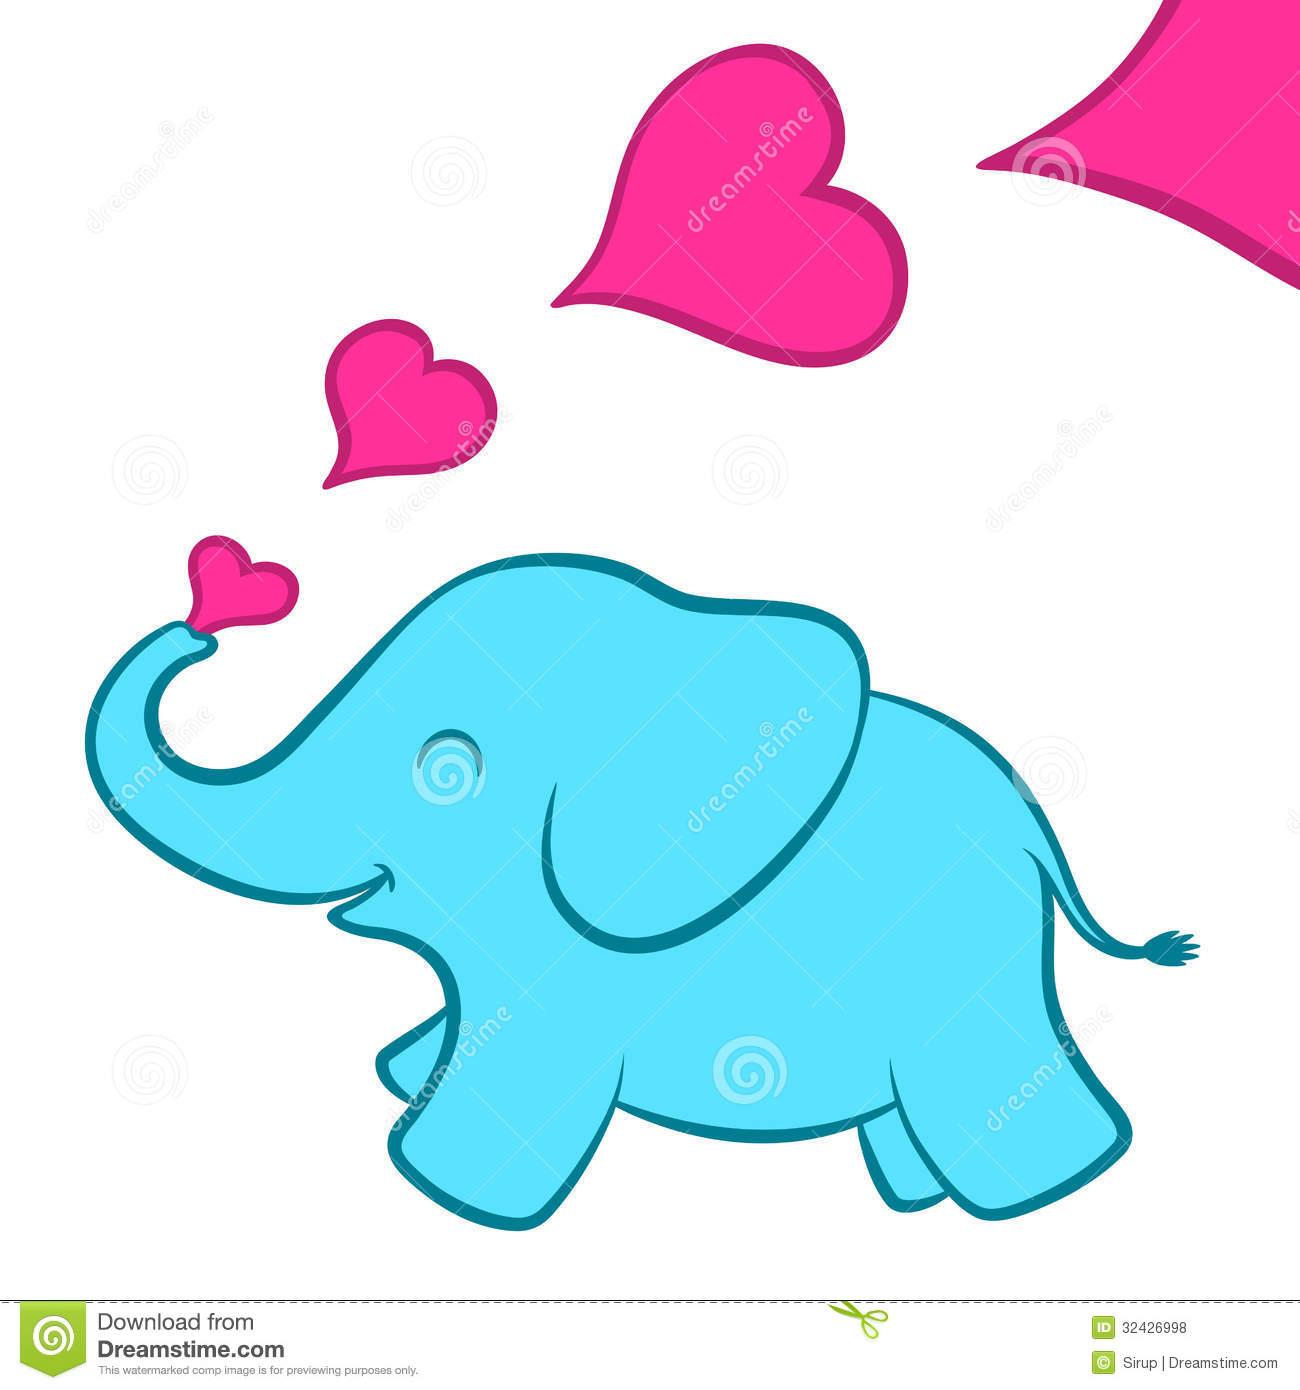 Cute pink elephant cartoon - photo#25